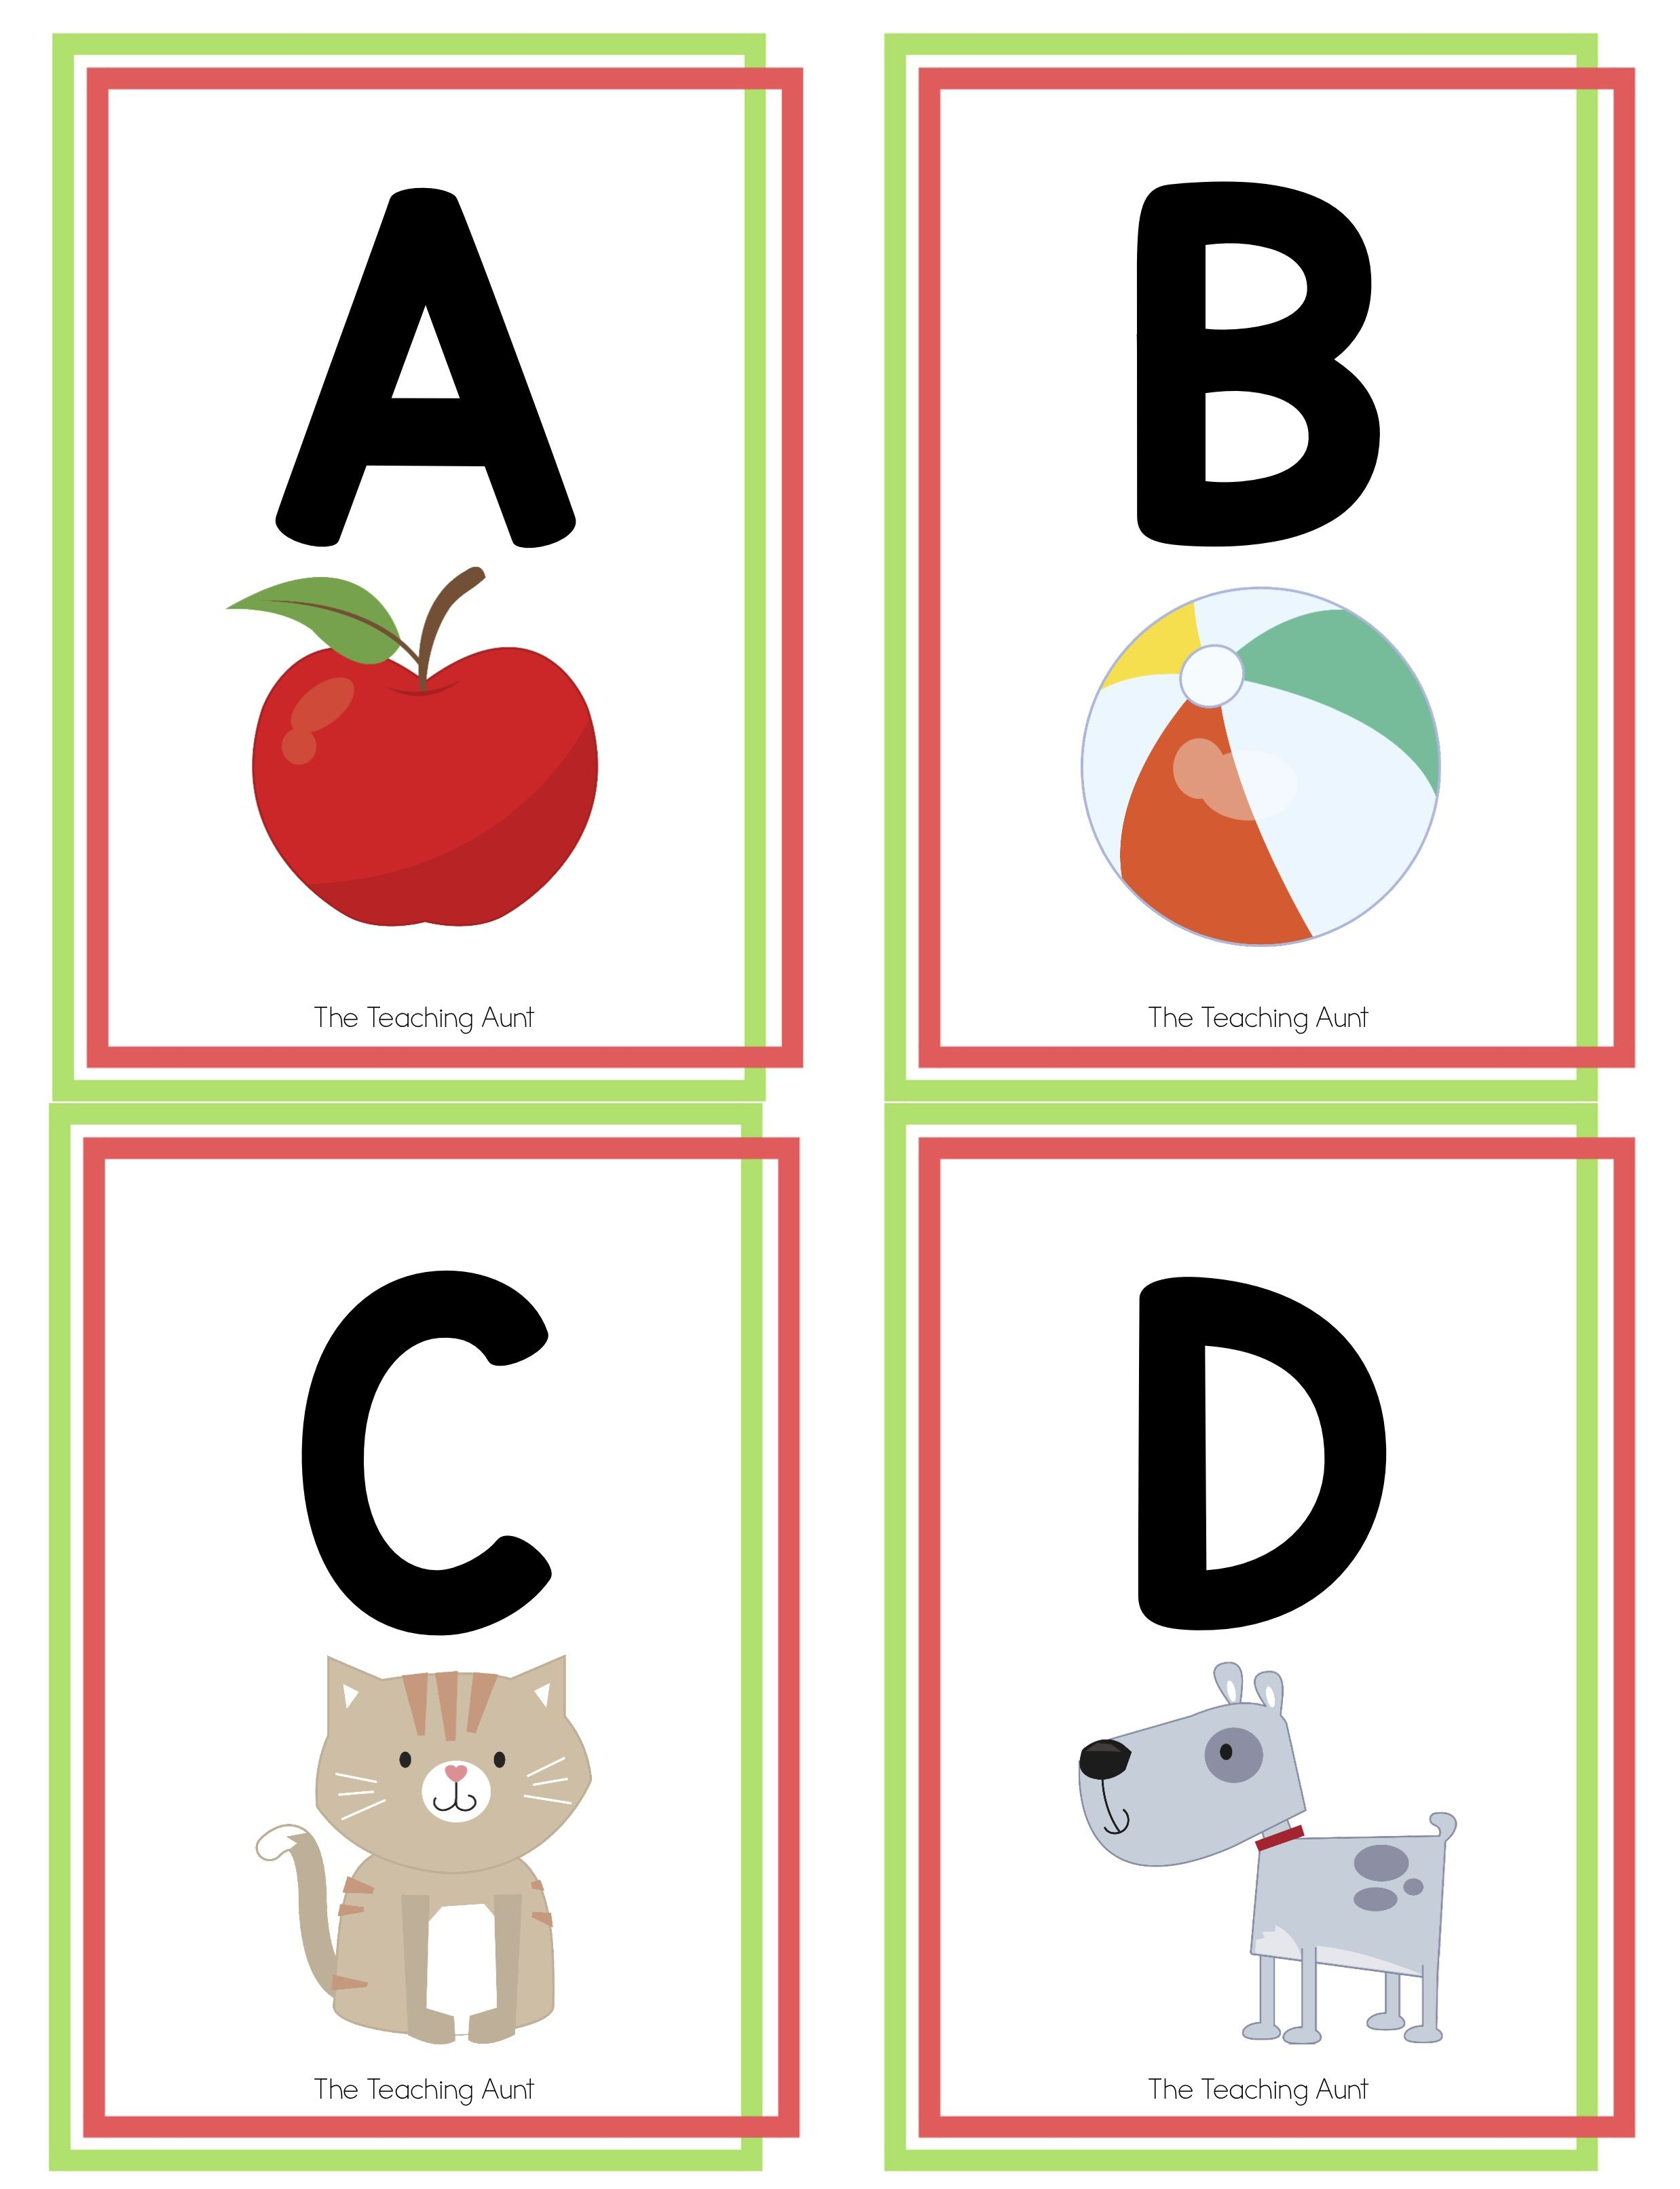 Alphabet Flashcards Free Printable The Teaching Aunt Alphabet Flashcards Printable Flash Cards Flashcards